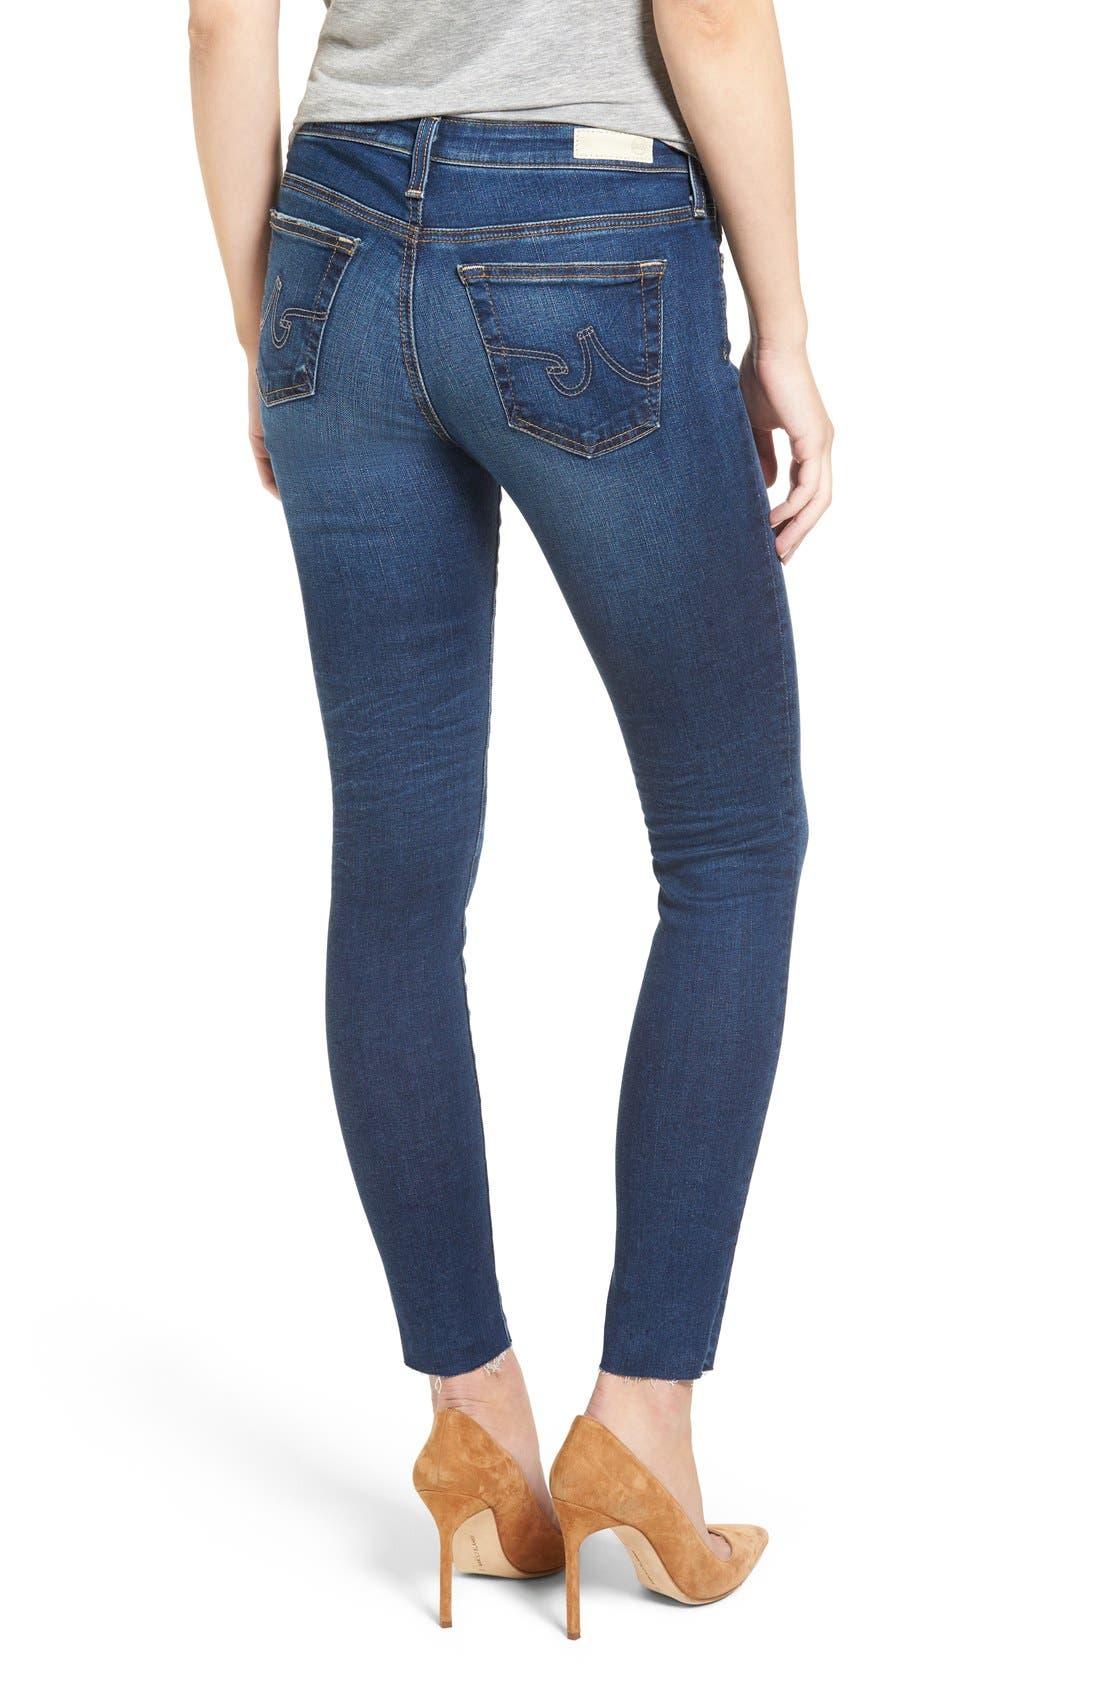 Alternate Image 3  - AG 'The Legging' Ankle Jeans (7 Year Break with Raw Hem)